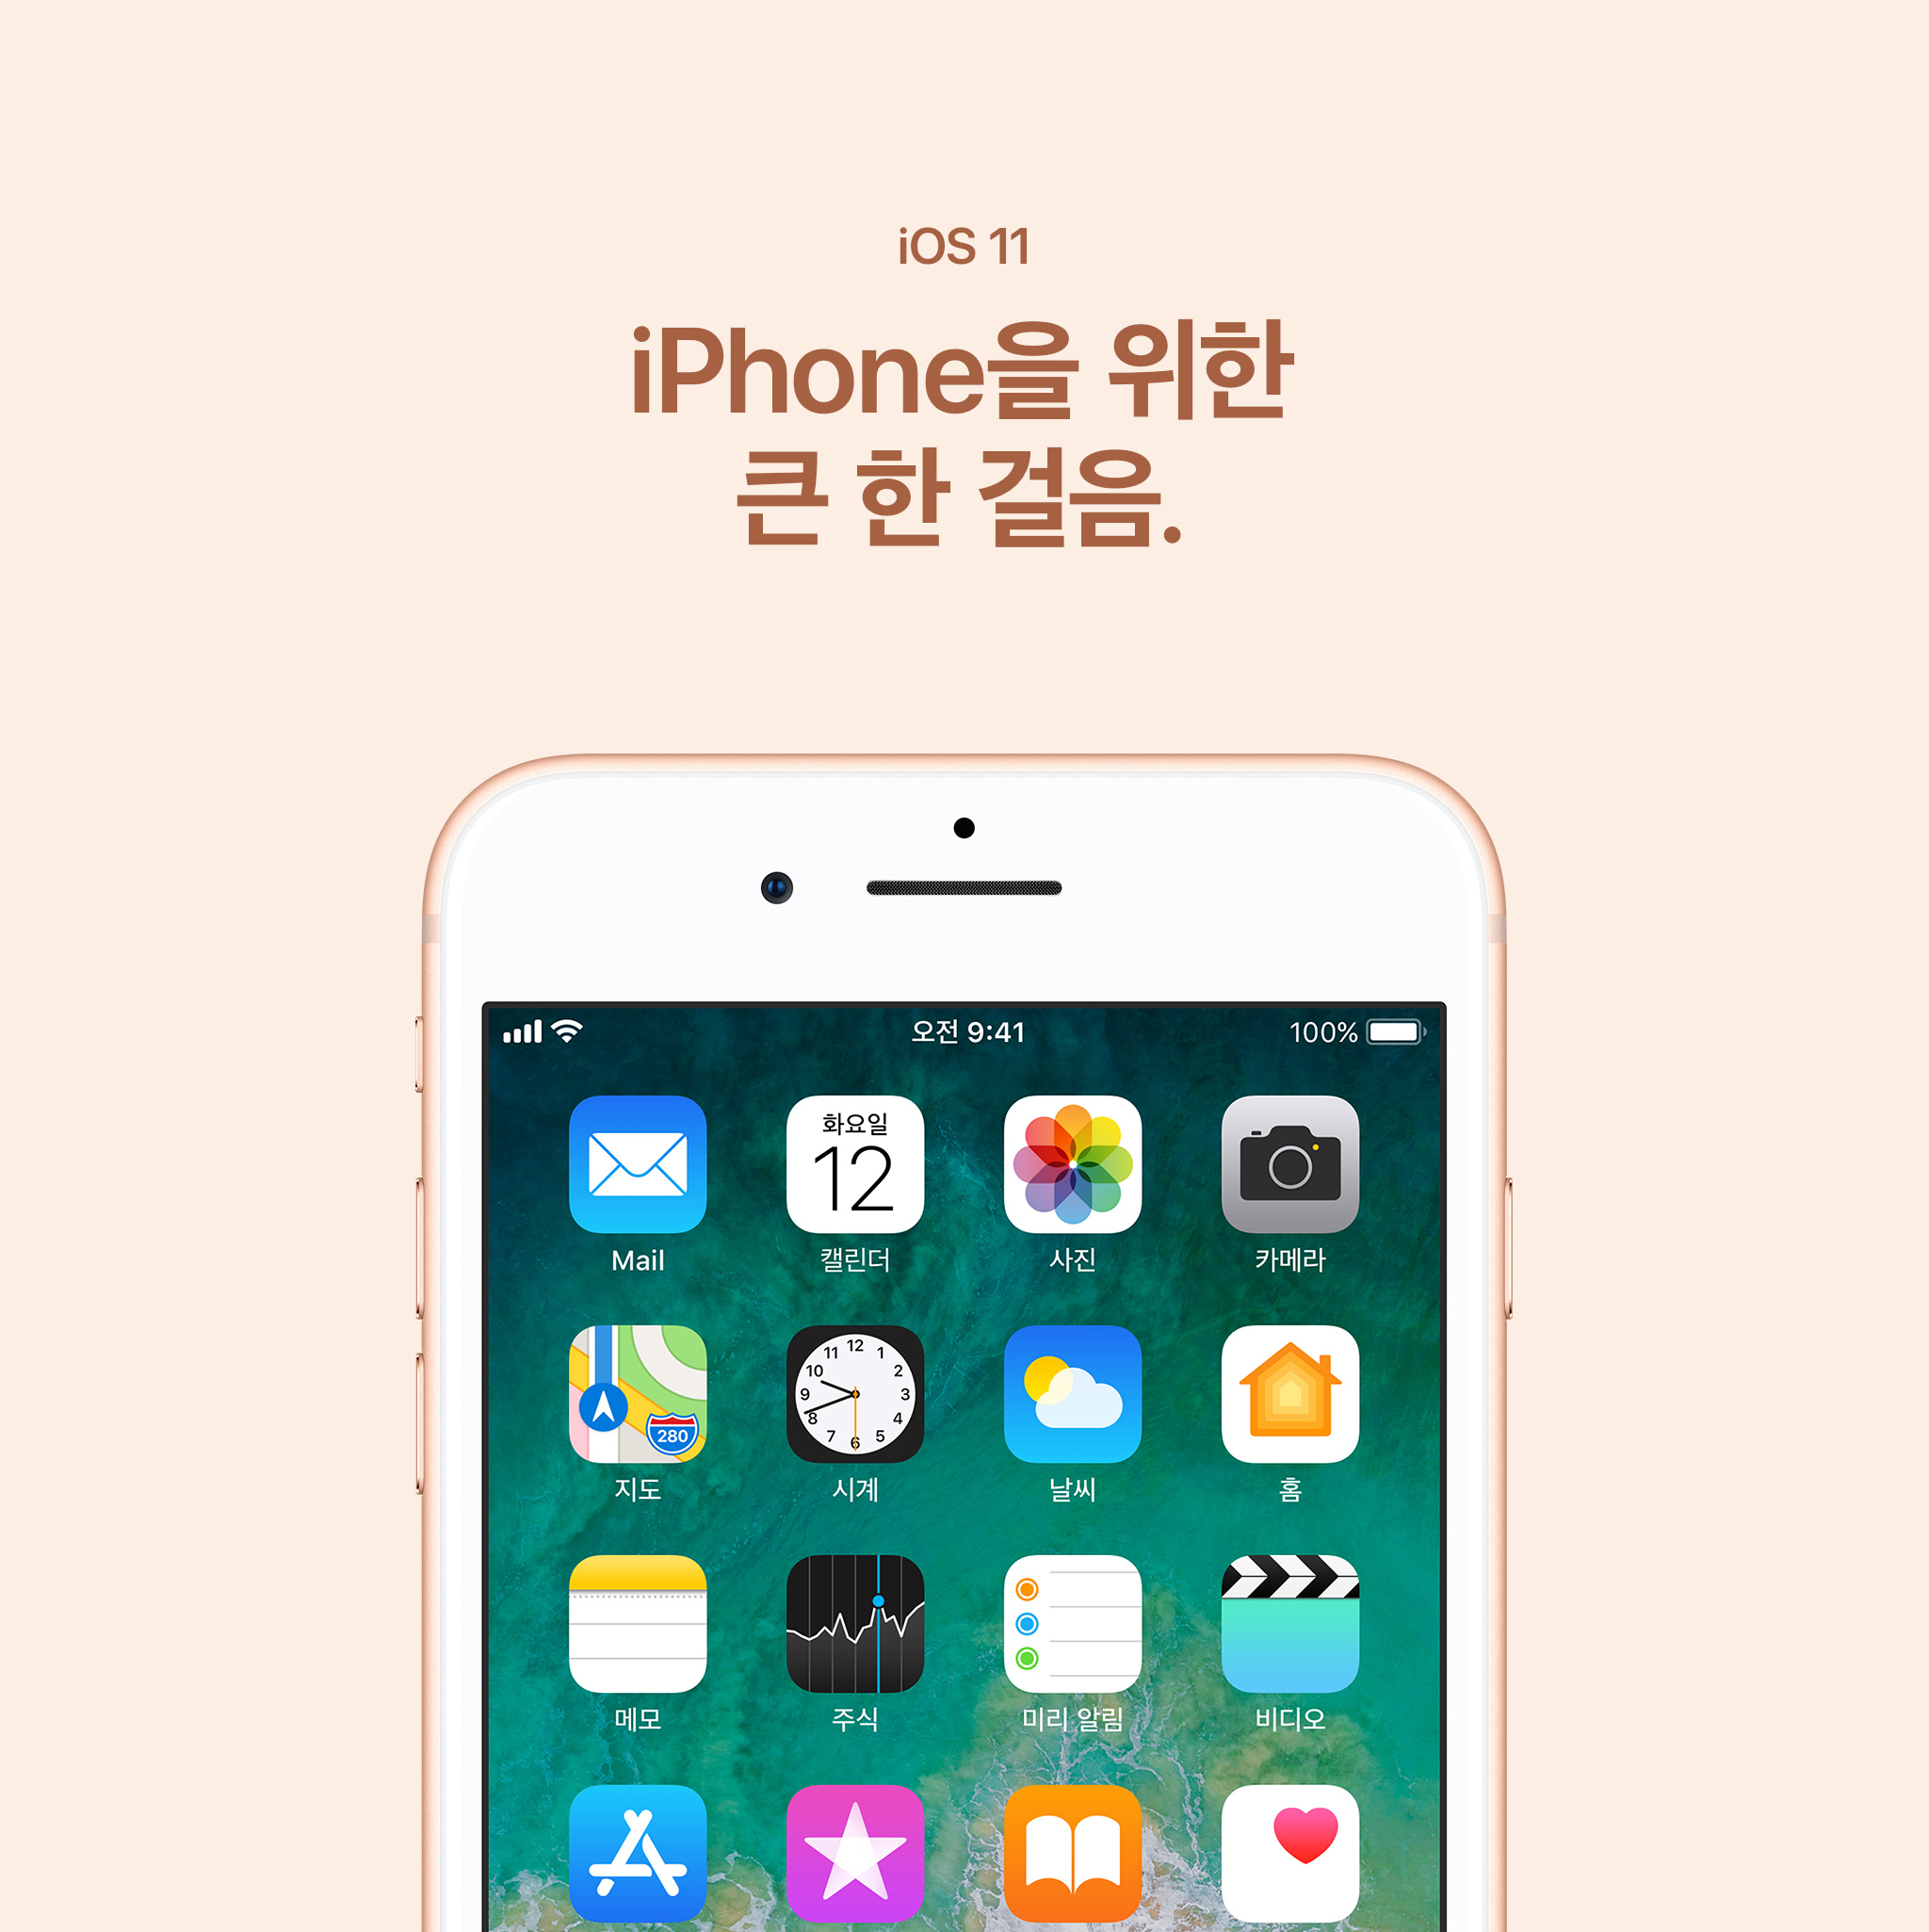 iOS11 iPhone을 위한 큰 한 겅음.